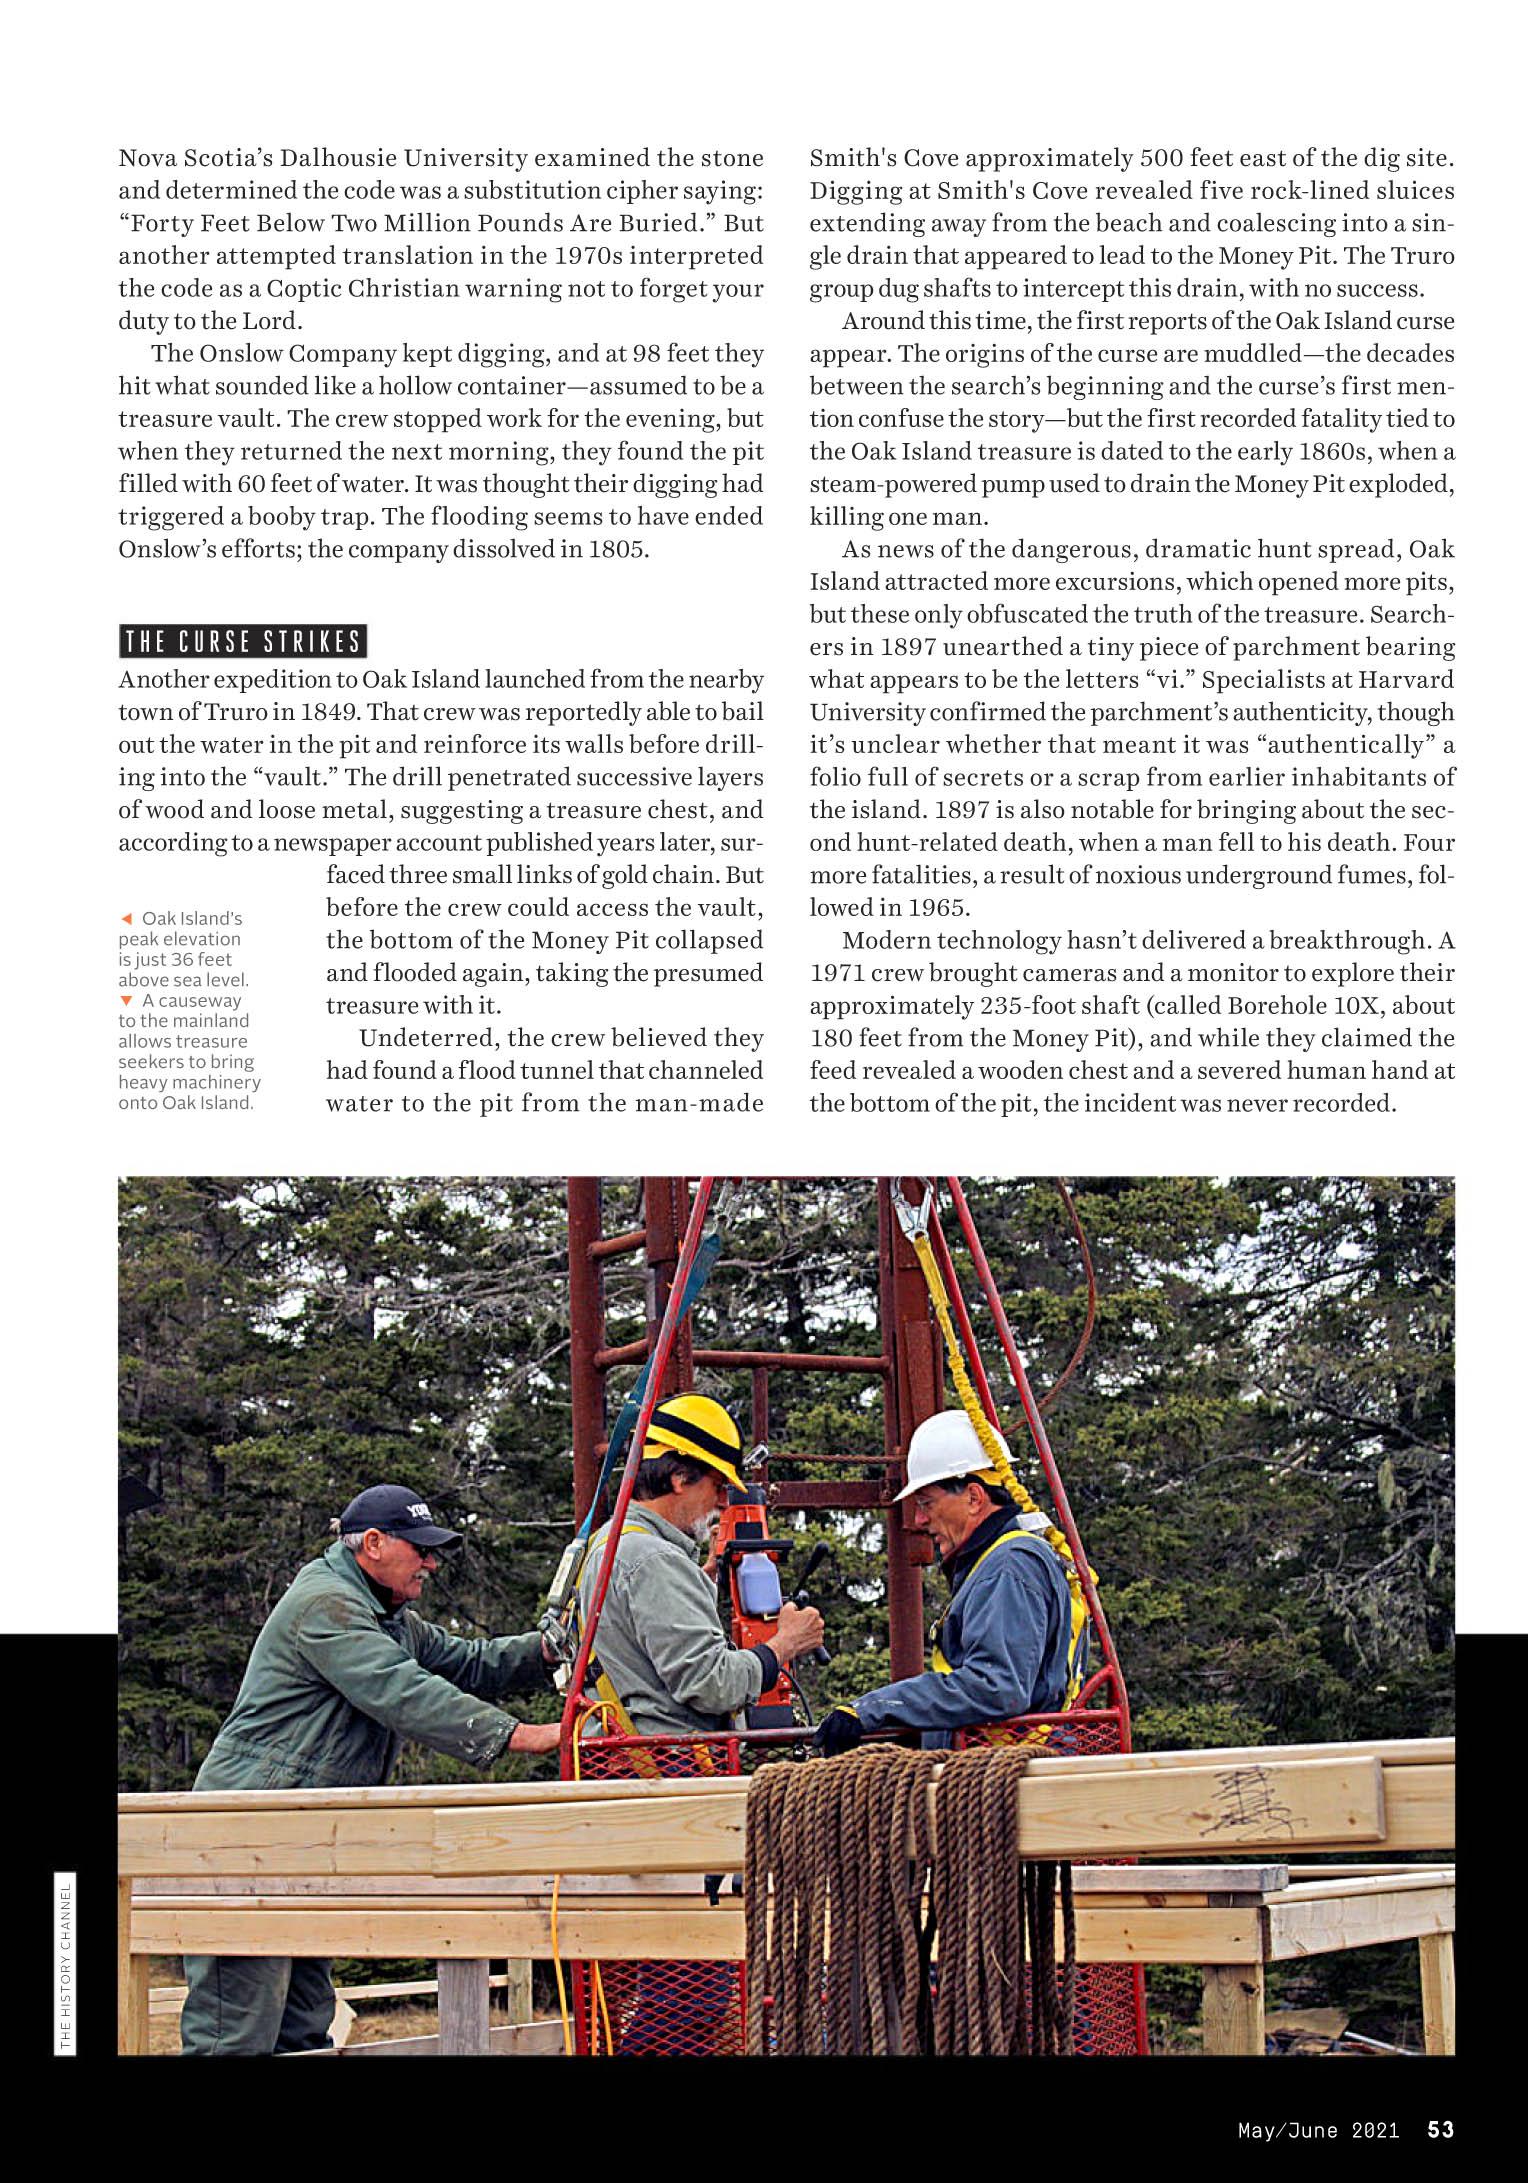 Popular Mechanics 2021-05-06 Oak Island 03.jpg